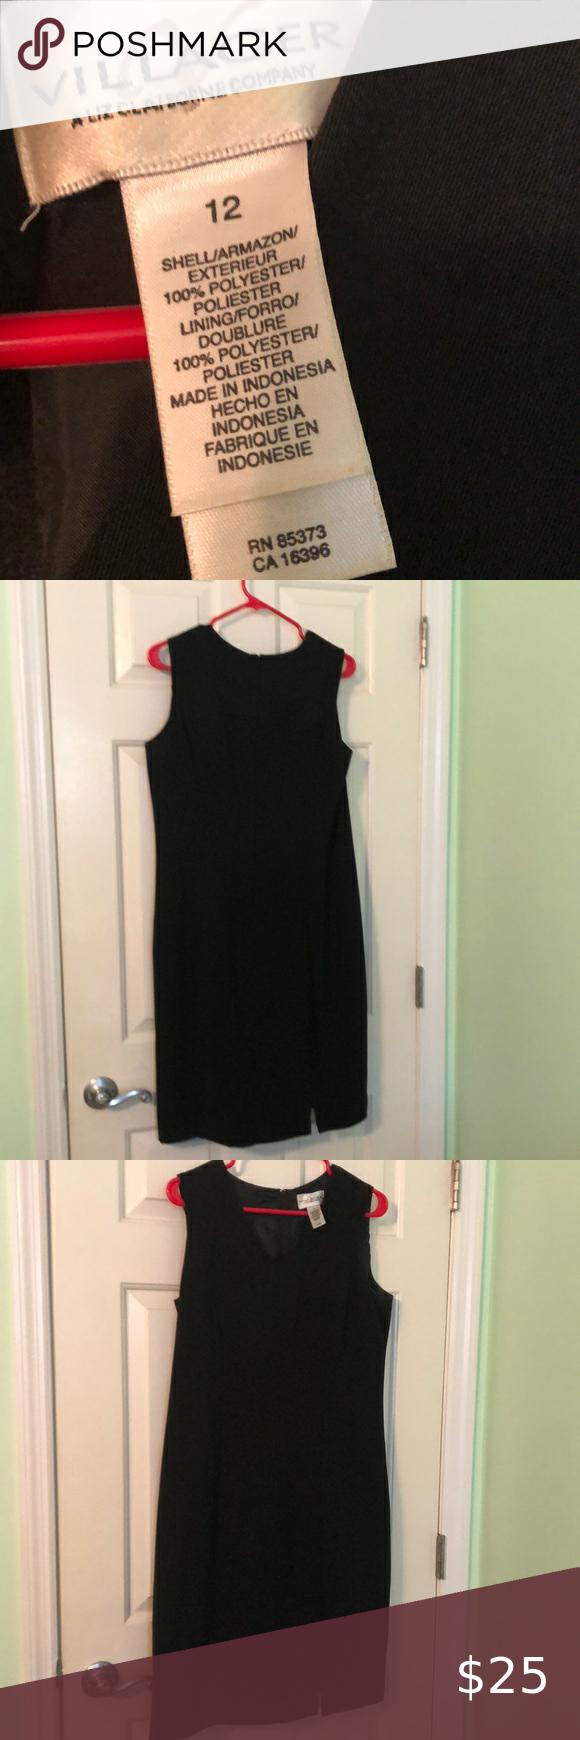 Simple Black A Line Dress Size 12 A Line Dress Black Sleeveless Dress Clothes Design [ 1740 x 580 Pixel ]